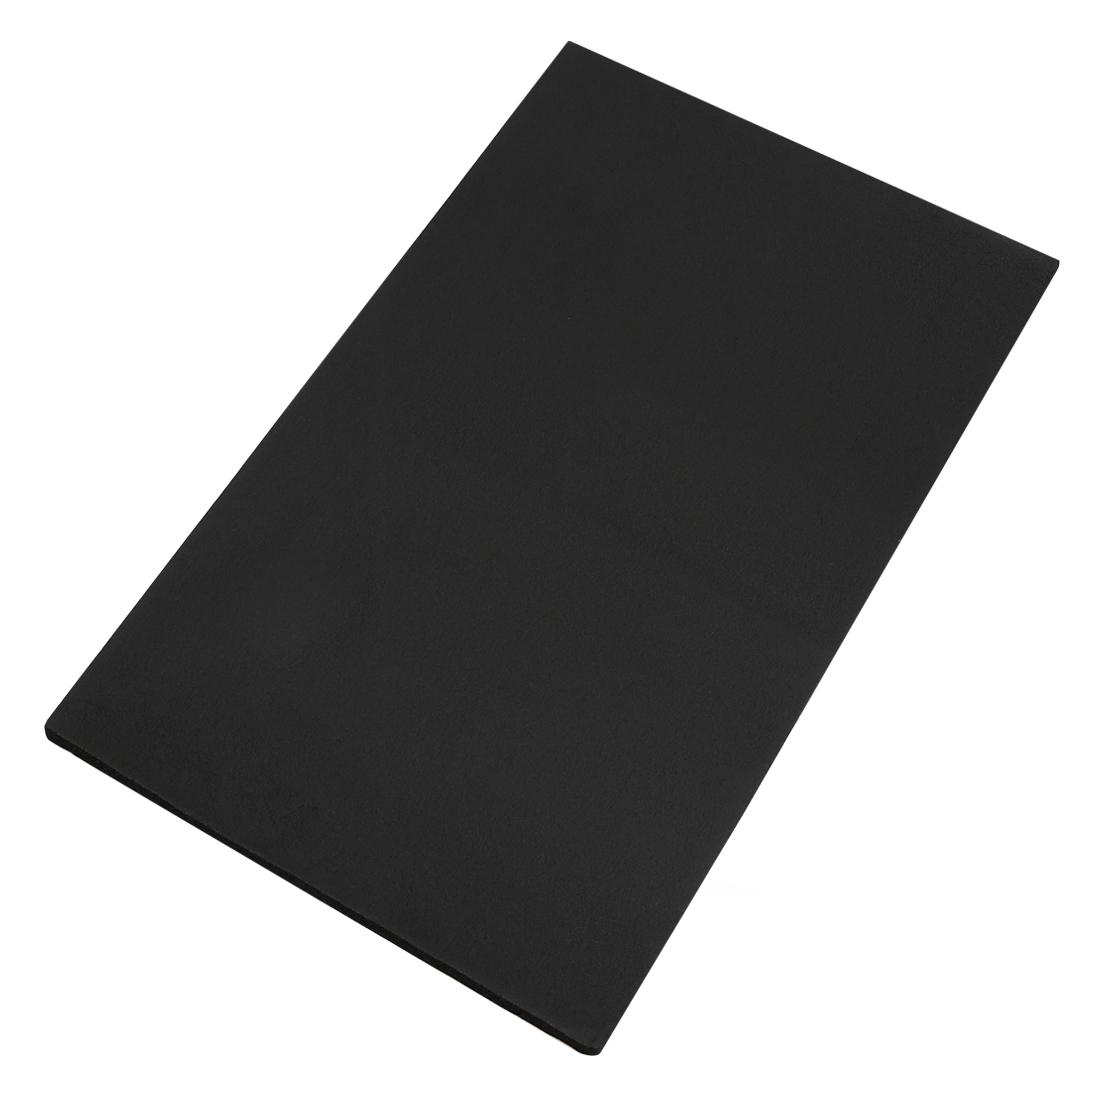 1.6sqft Sound Deadener Heat Insulation Mat Acoustic Barrier 50 x 30 x 0.8cm